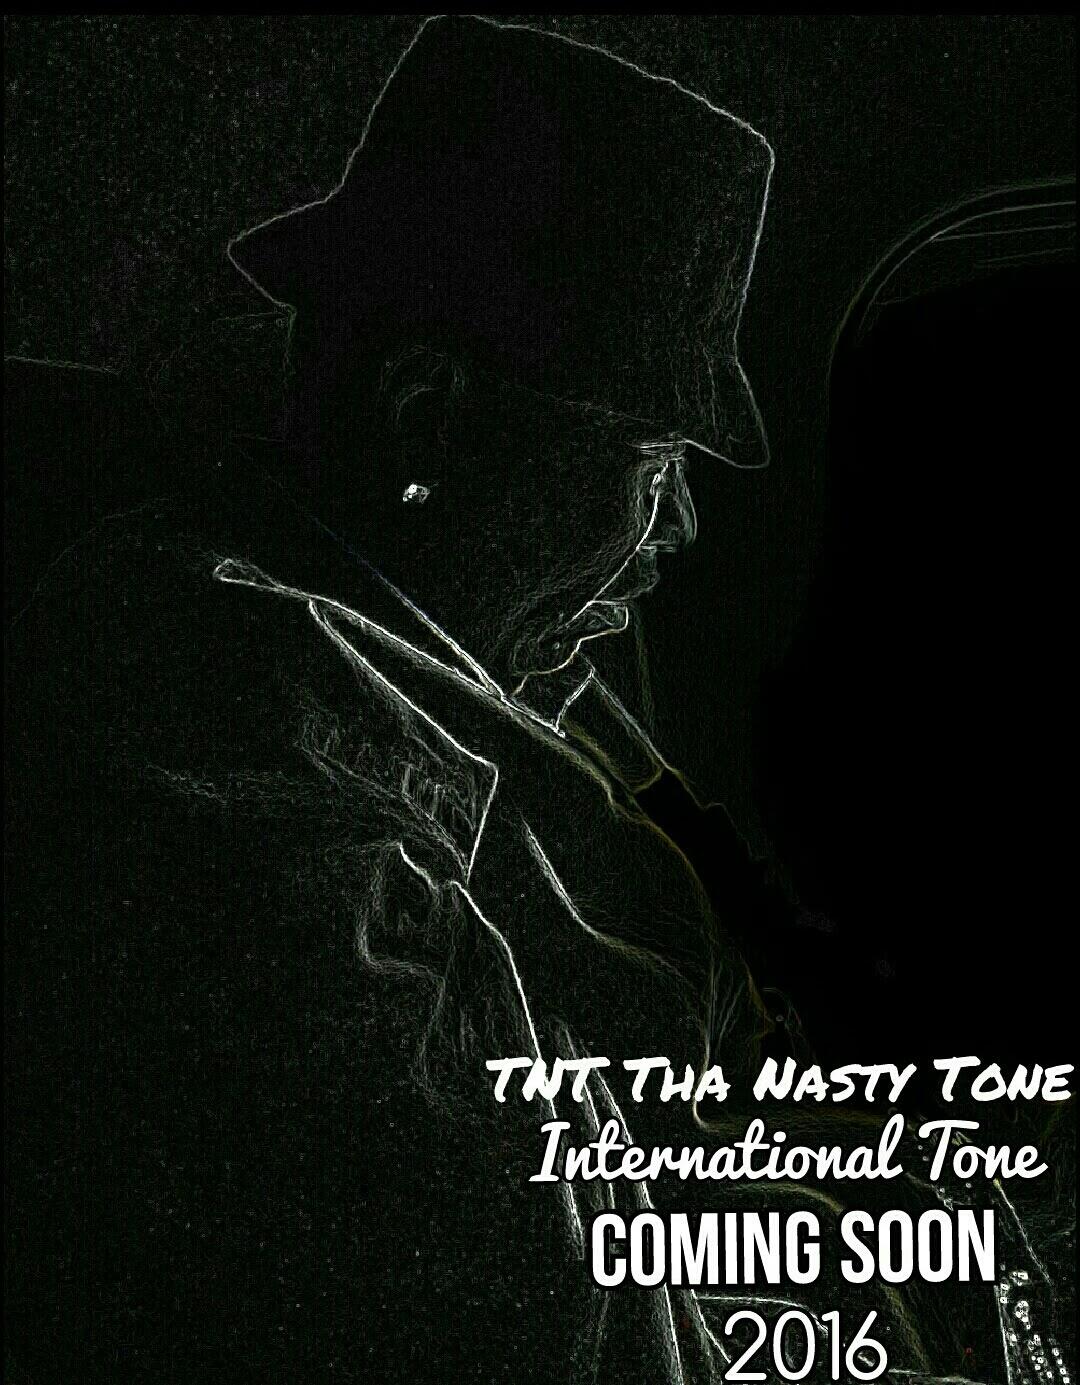 International Tone